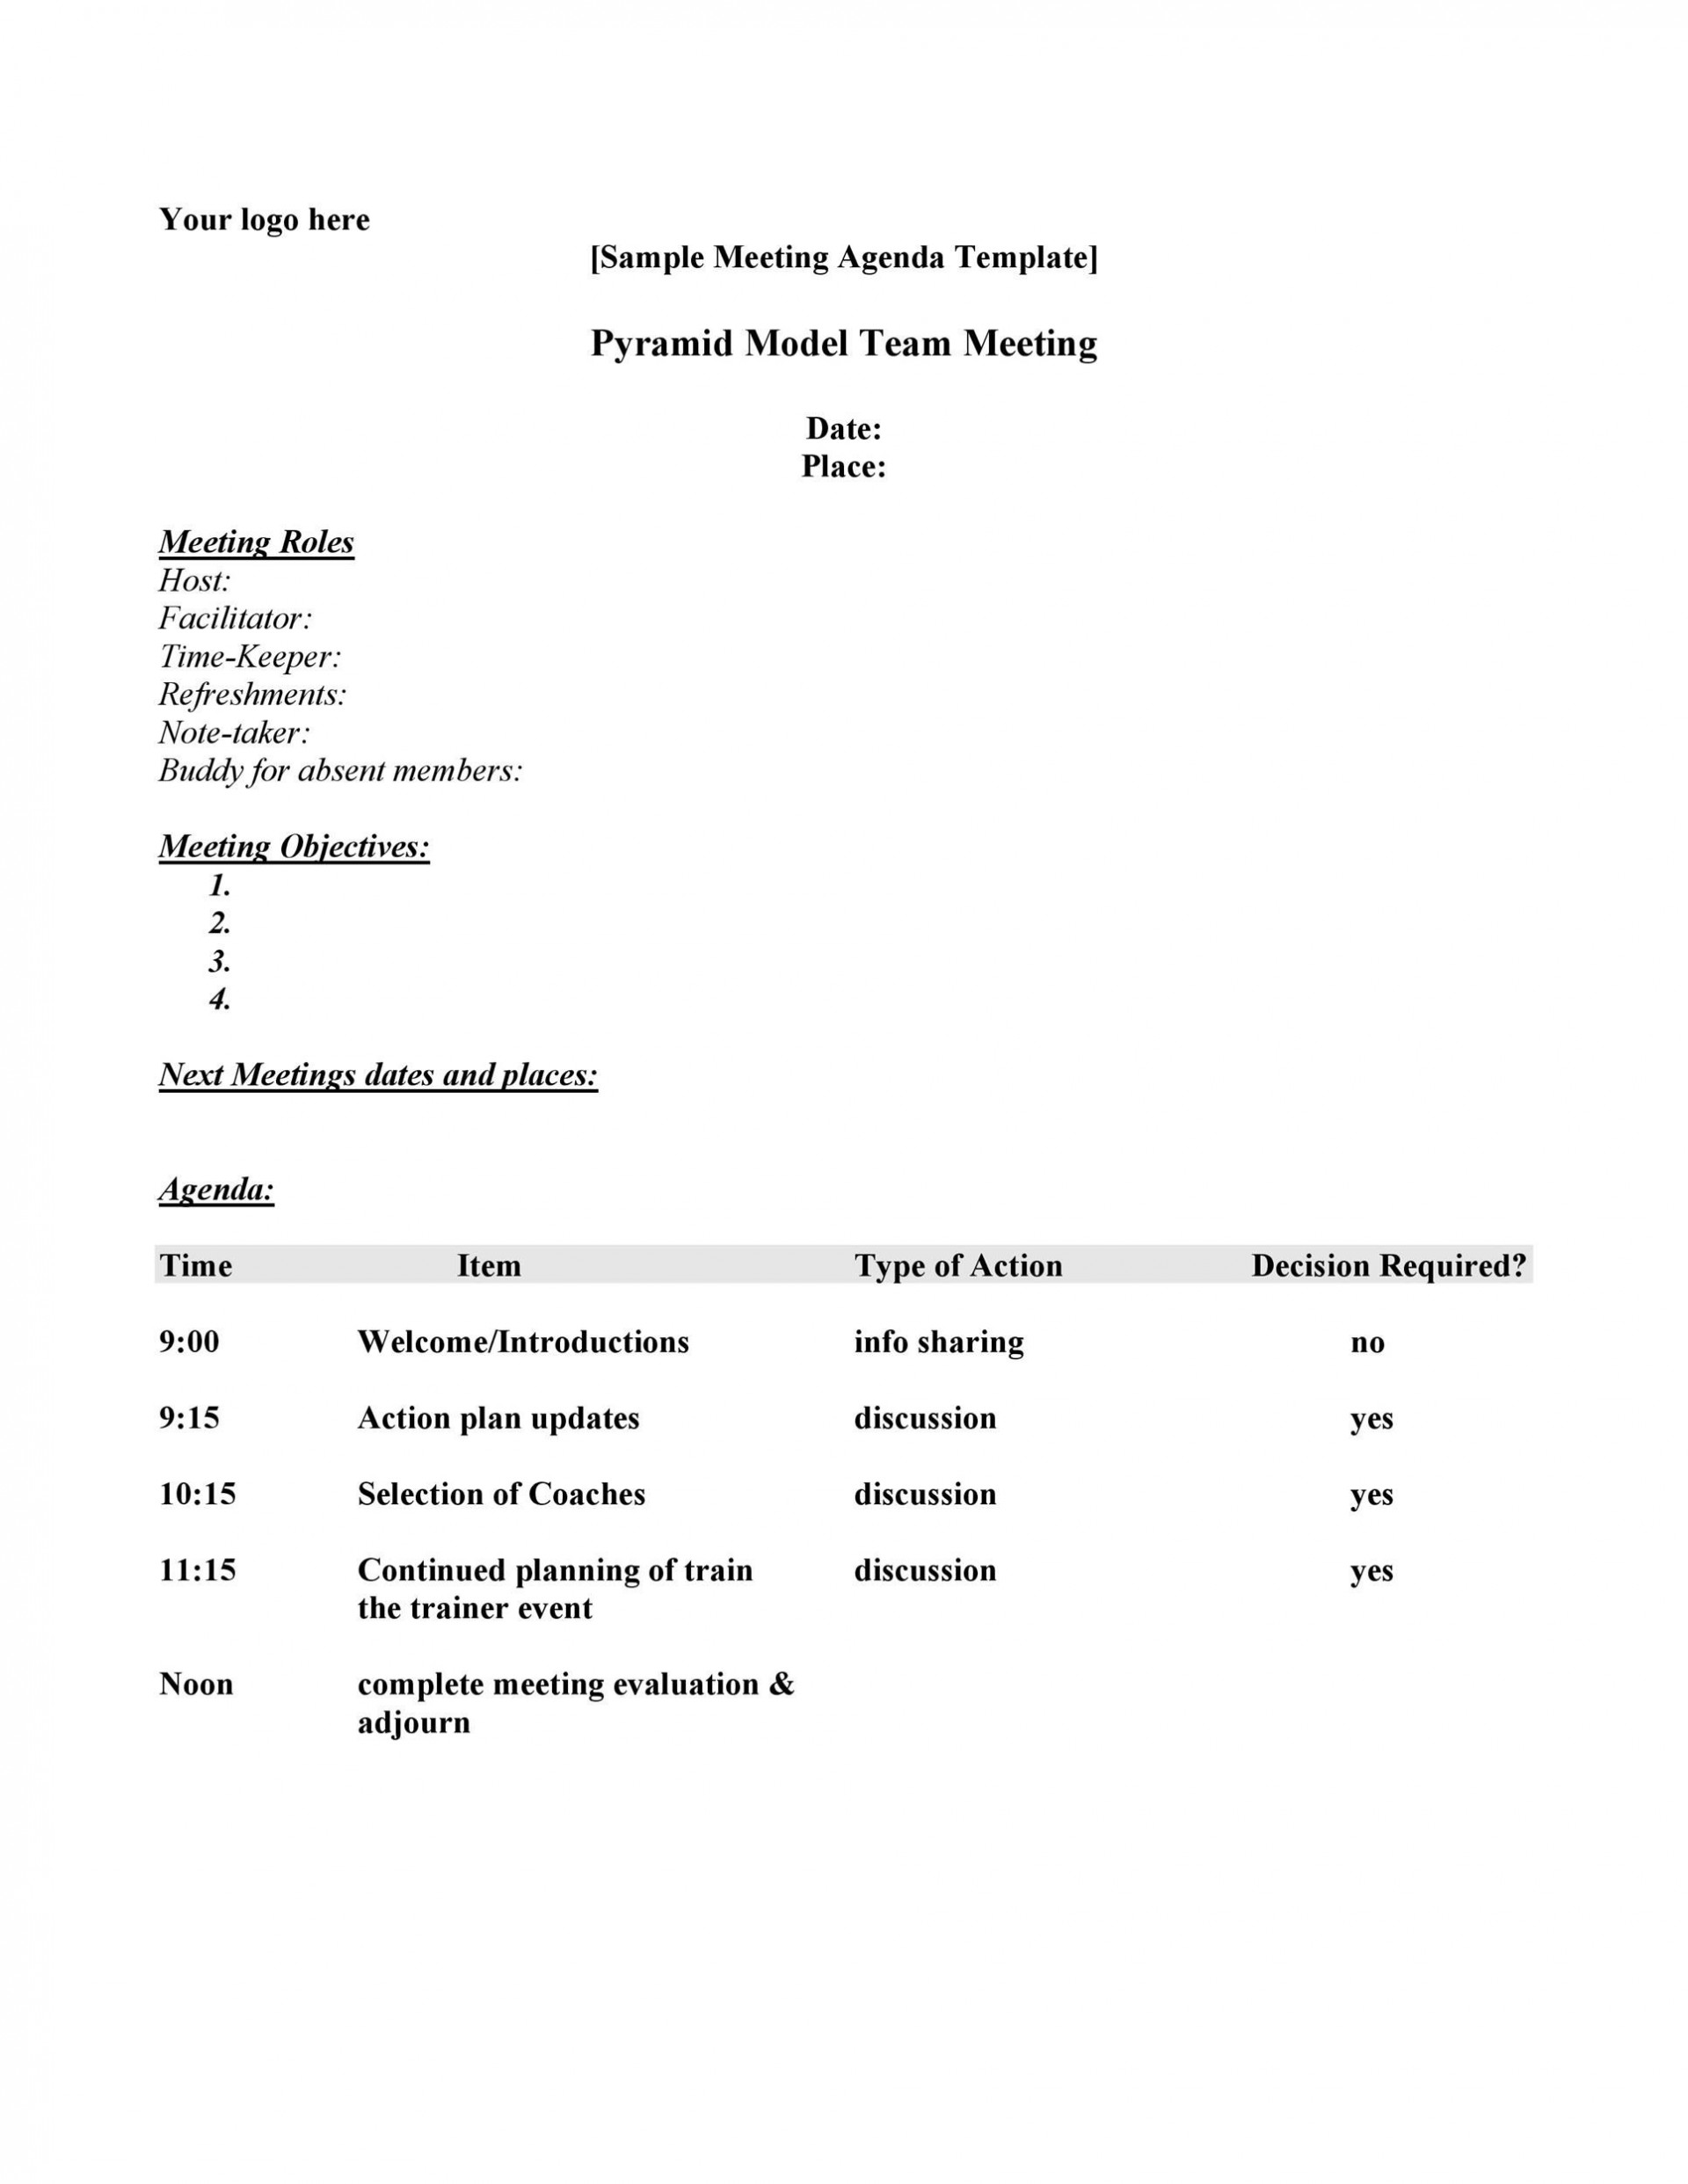 008 Unique Formal Meeting Agenda Template Image  Board Example Pdf1920